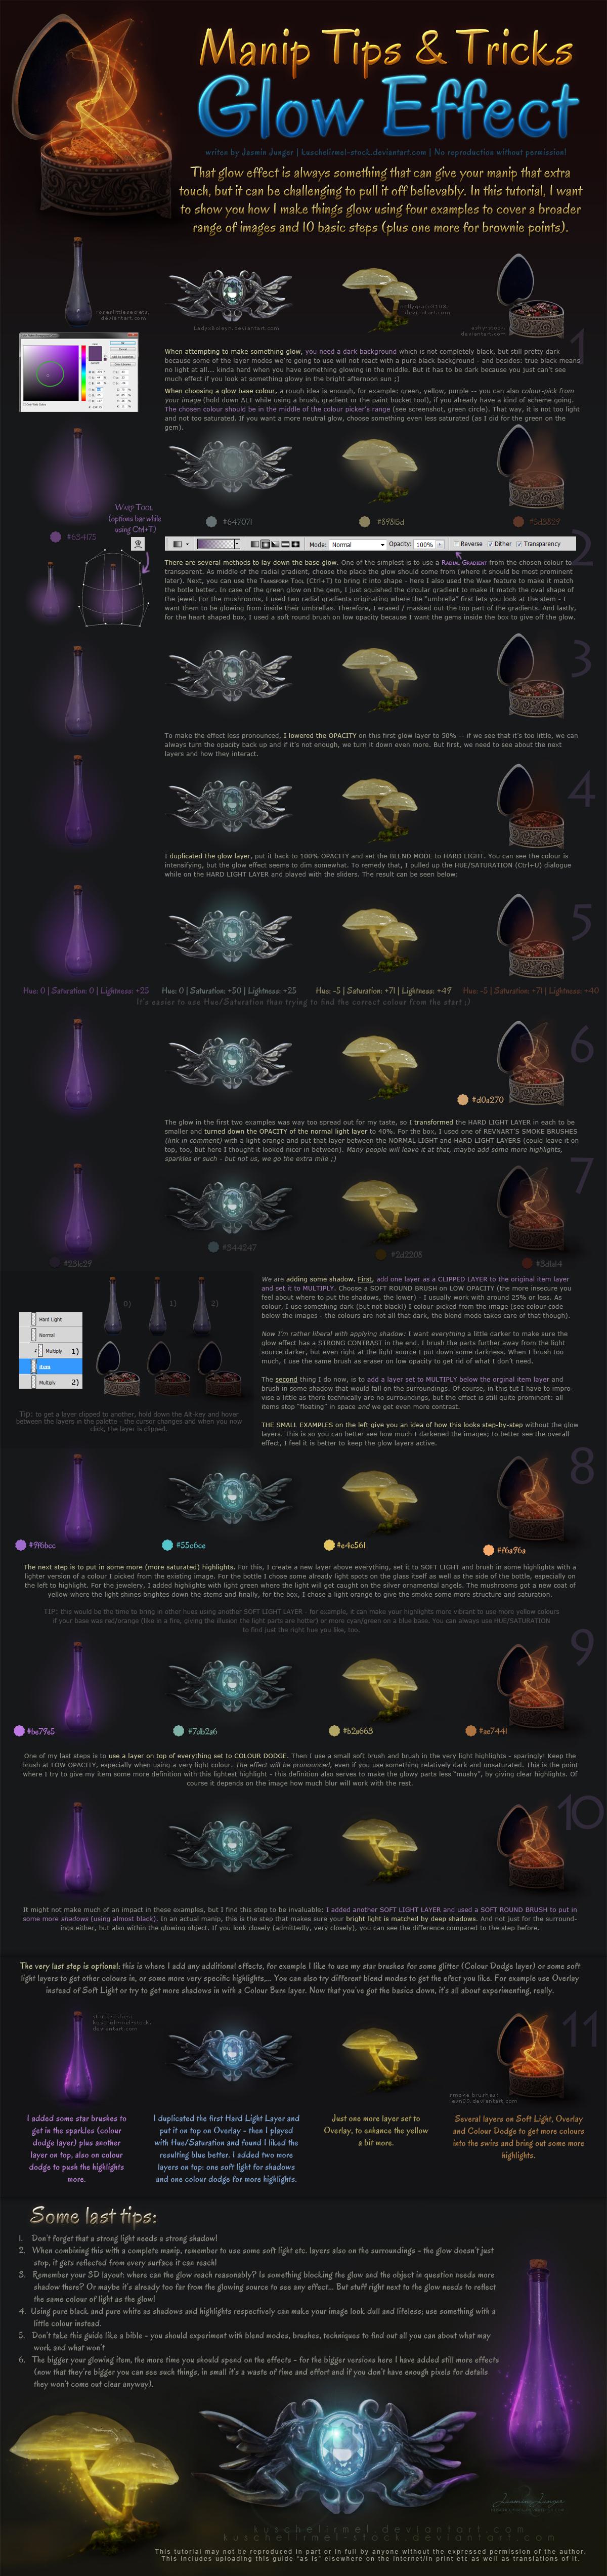 Manip Tips + Tricks - Glow Effect